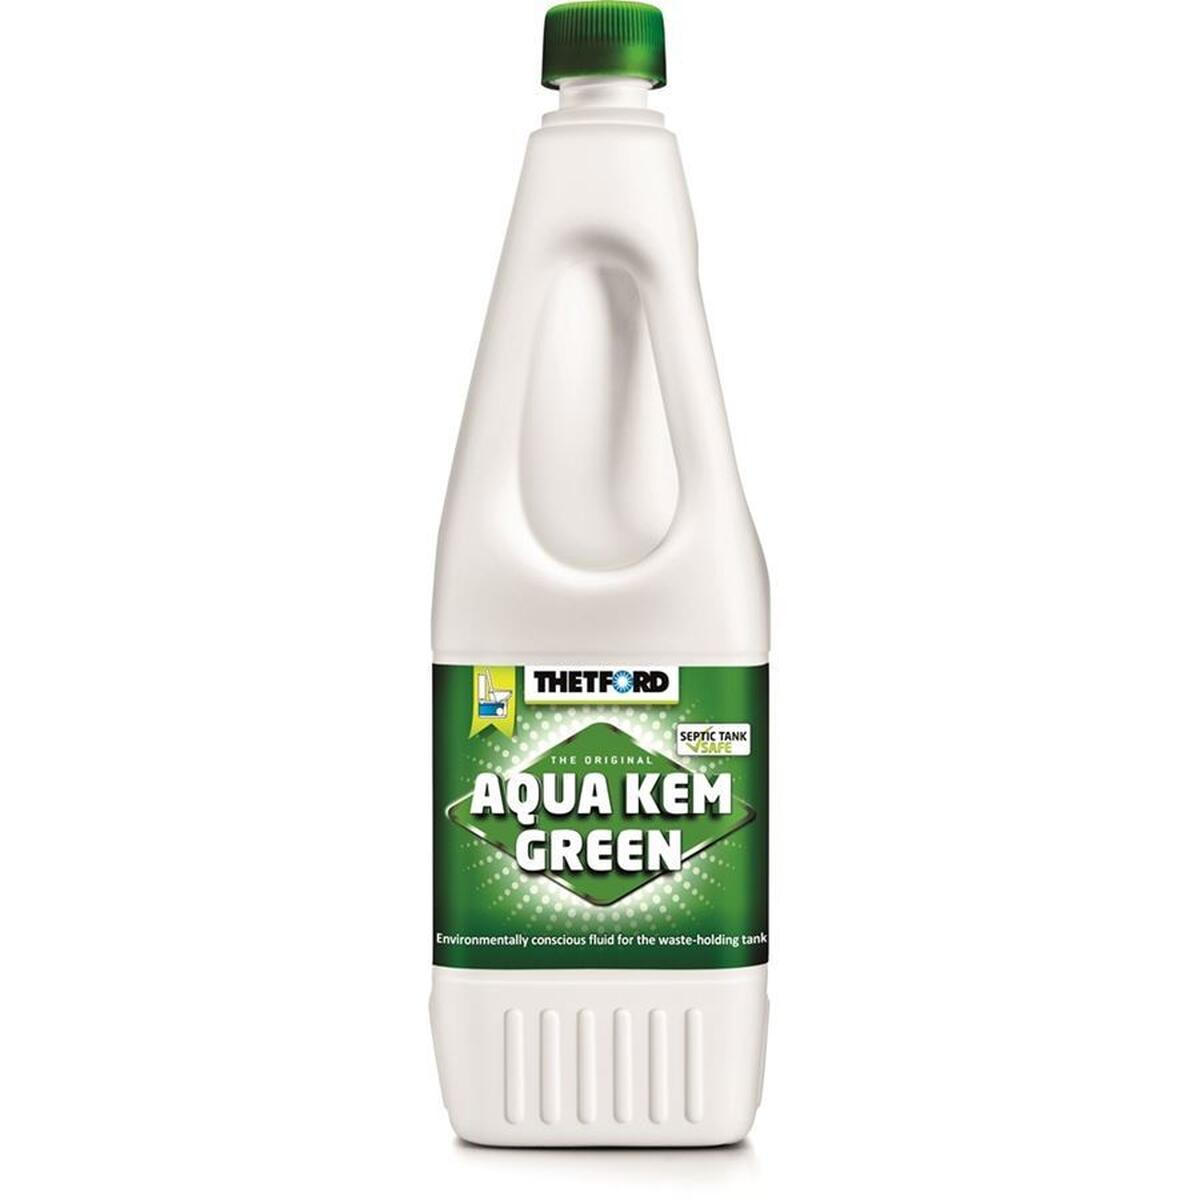 thetford-aqua-kem-green